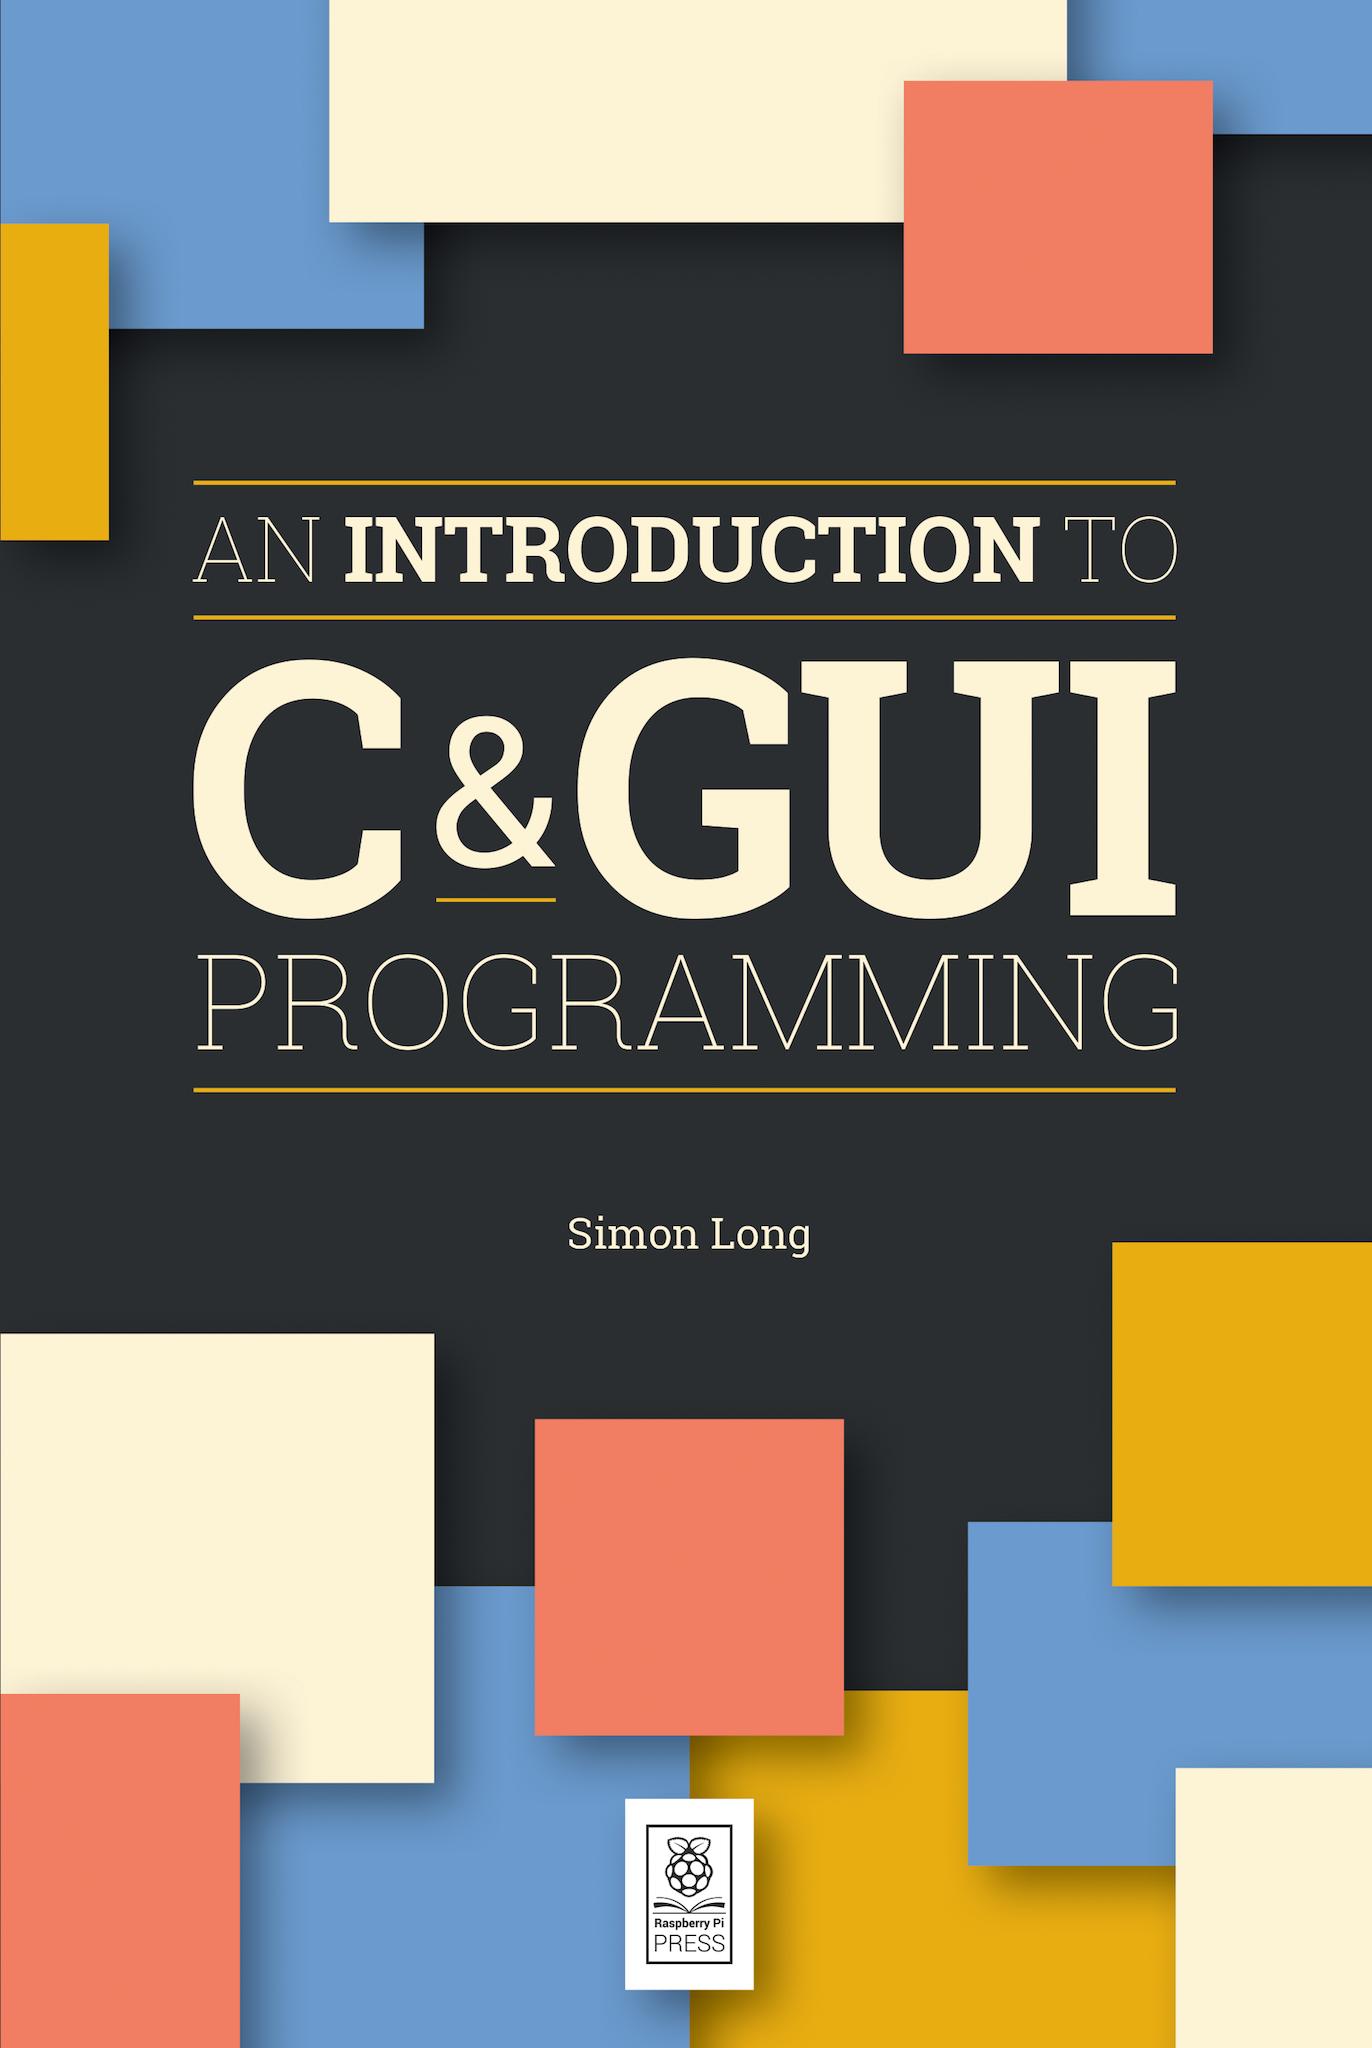 Gui programming cover